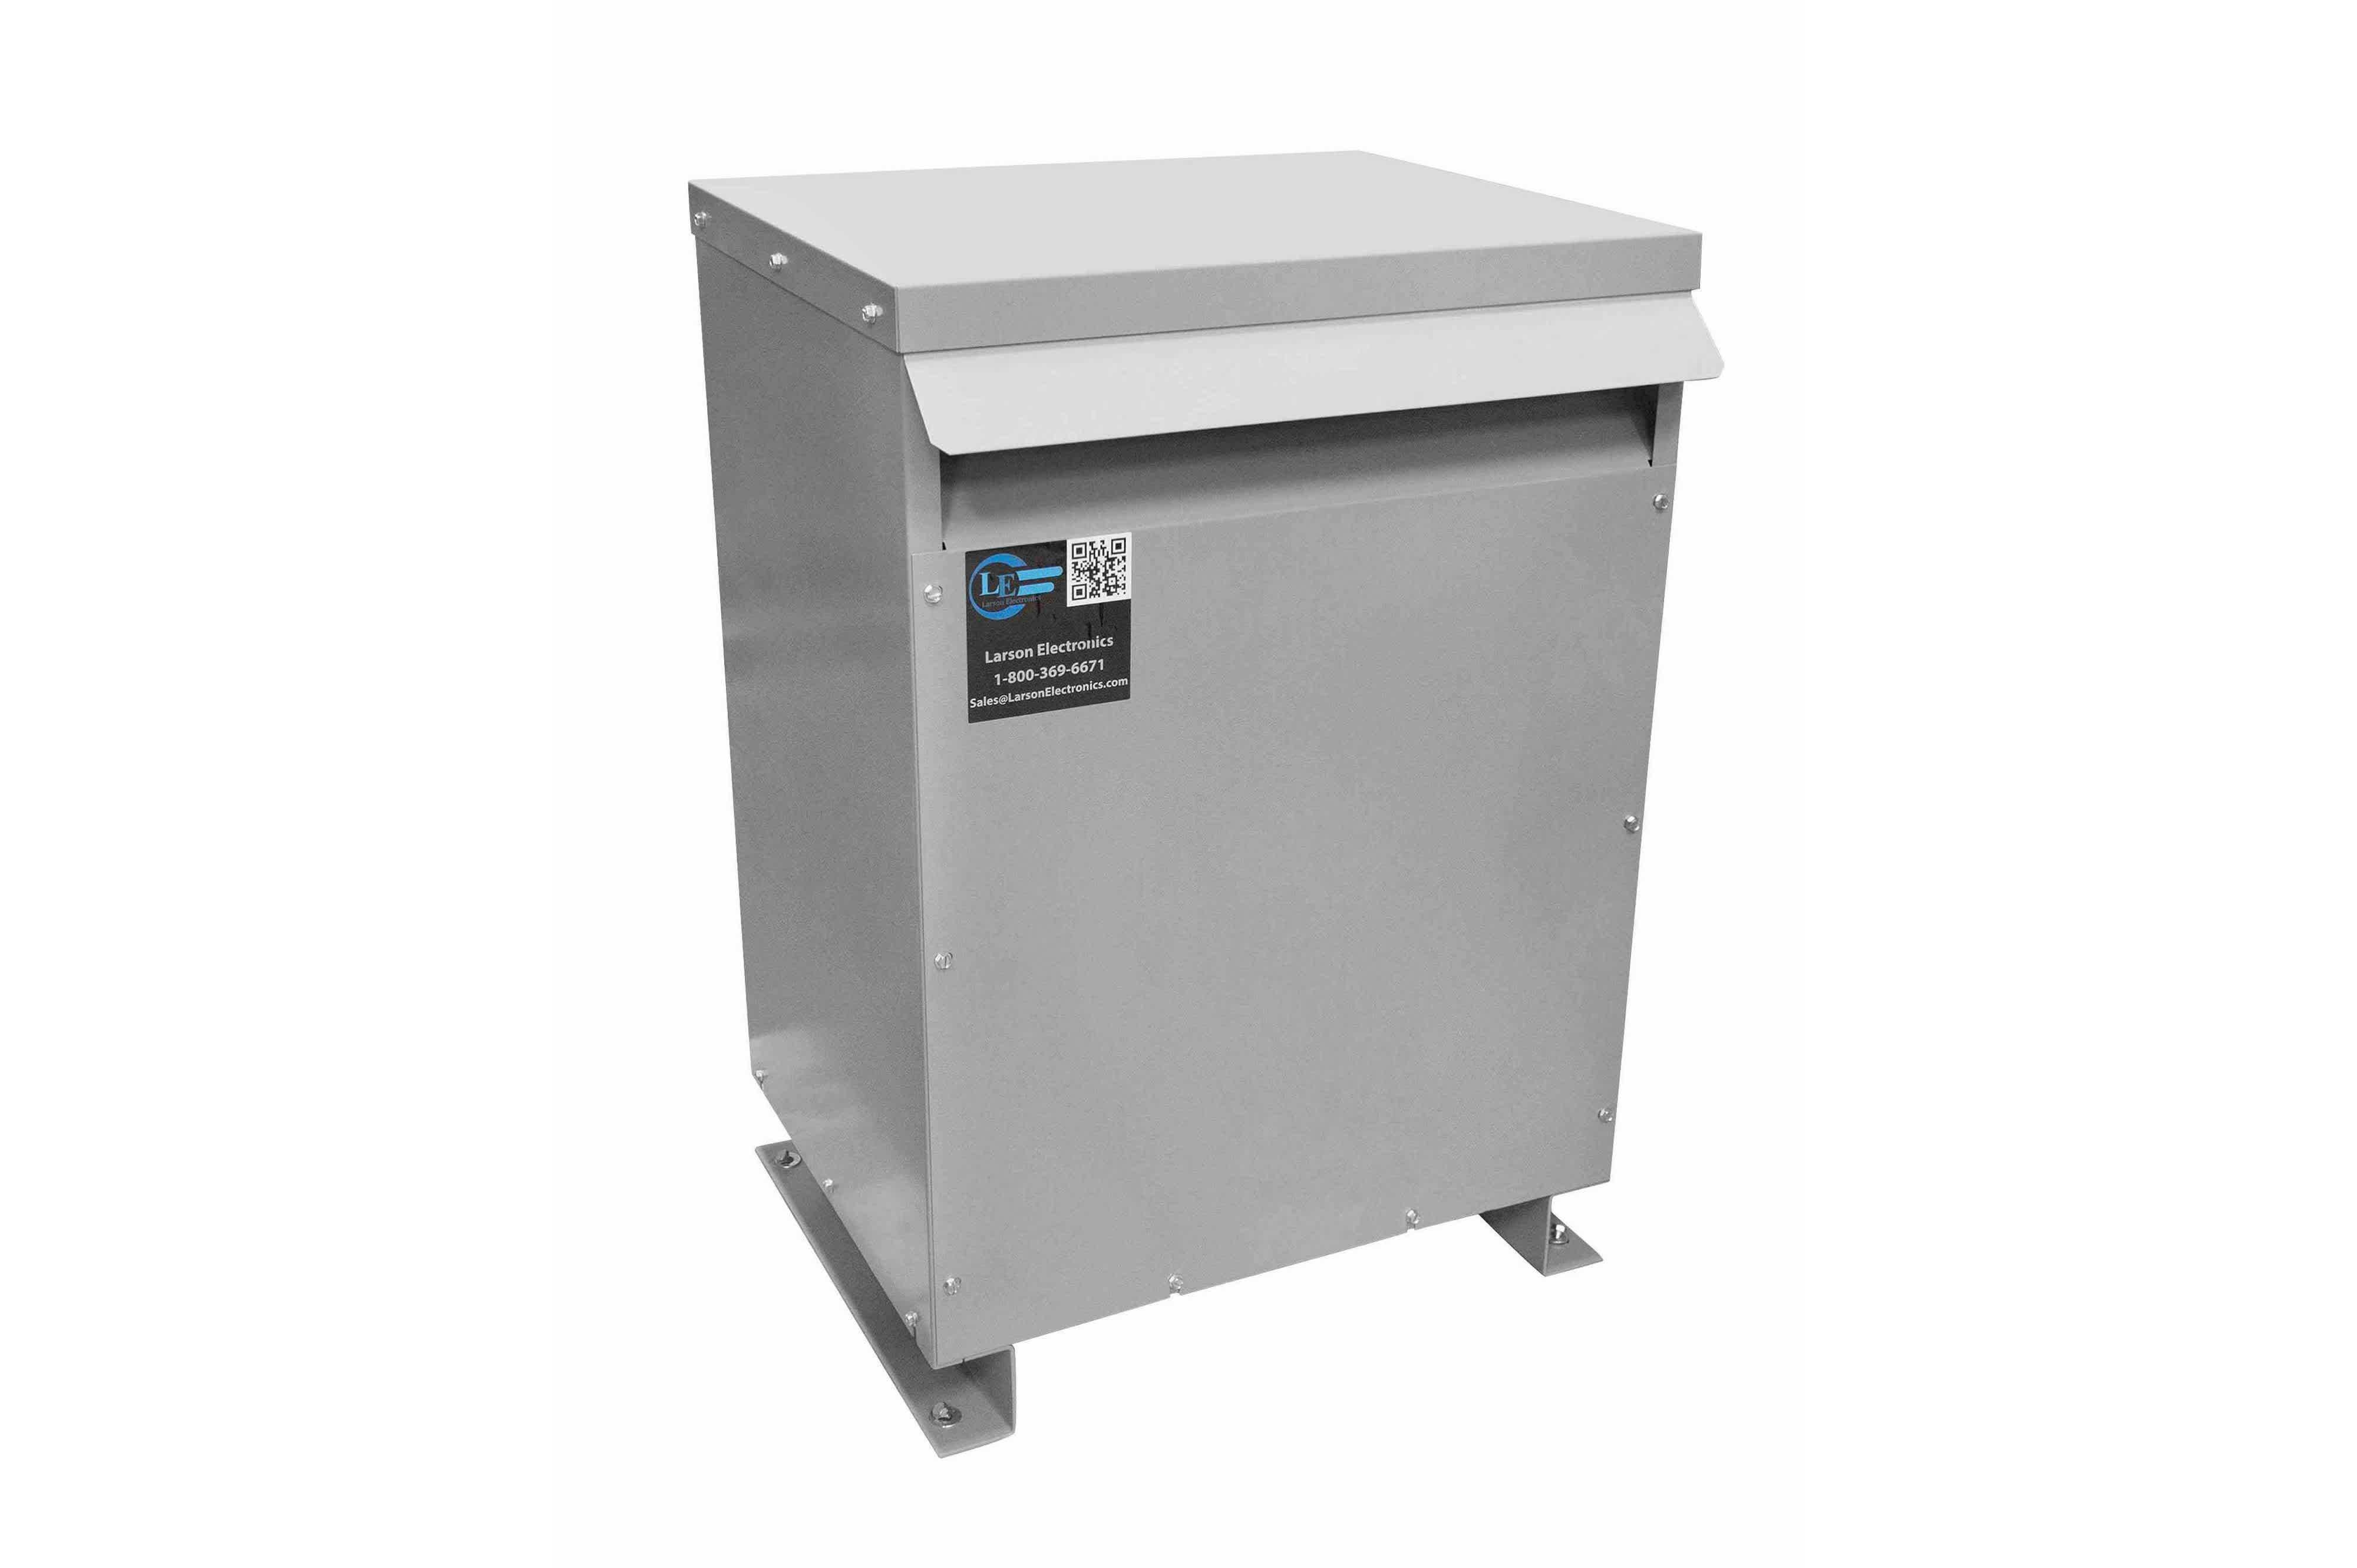 36 kVA 3PH Isolation Transformer, 480V Wye Primary, 600Y/347 Wye-N Secondary, N3R, Ventilated, 60 Hz